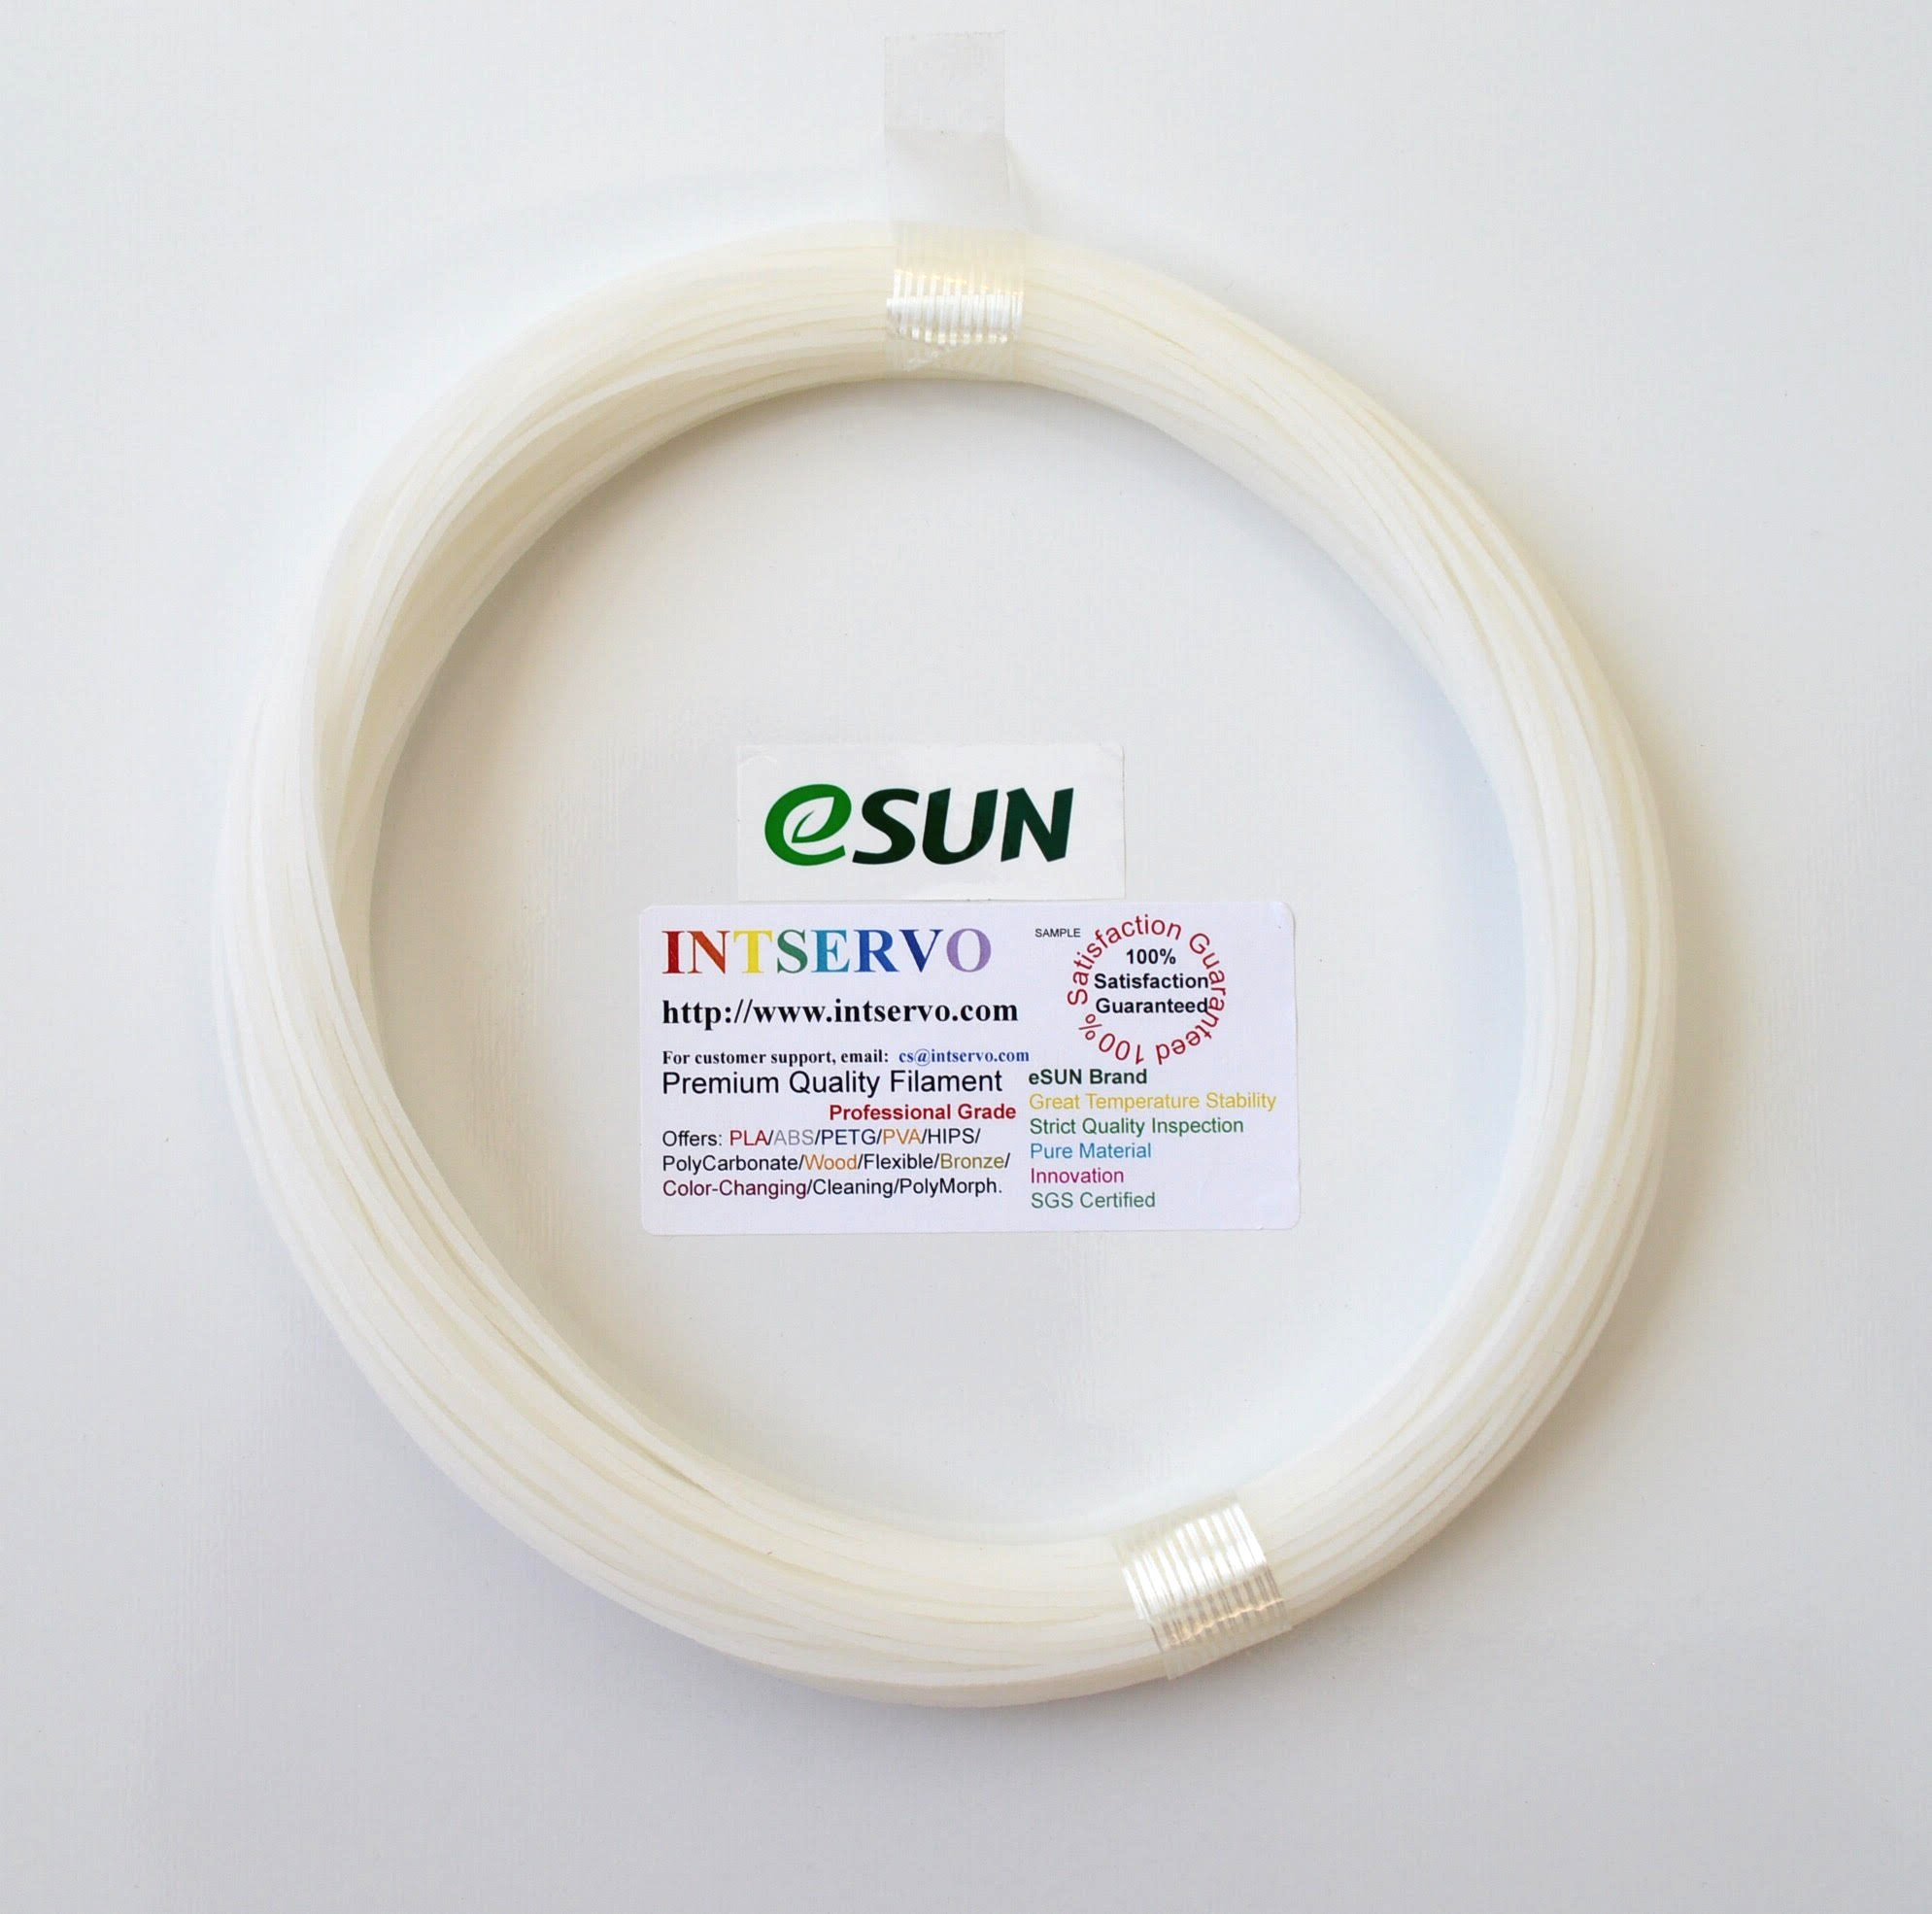 eSUN 3D Printer CLEANING Filament 1.75mm Natural 0.1kg for all 1.75mm FDM 3D Printers, 1.75mm Cleaning by eSUN